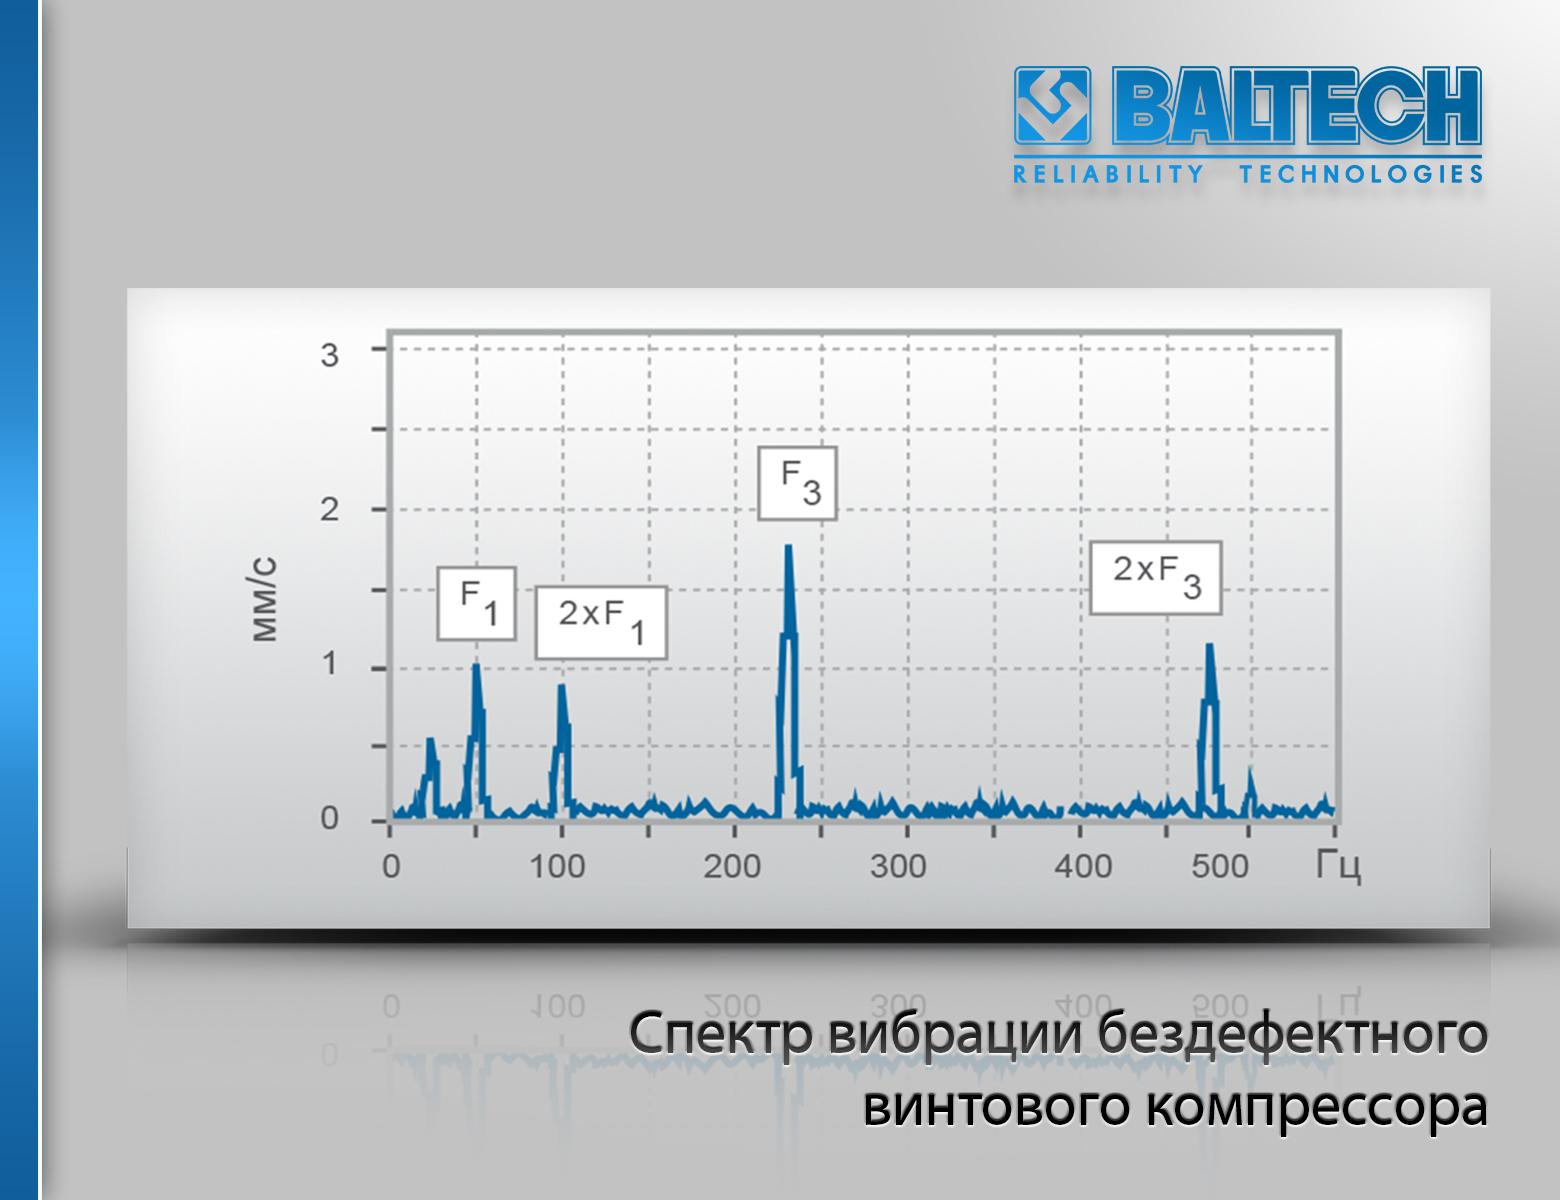 Спектр вибрации бездефектного винтового компрессора, вибродиагностика компрессора